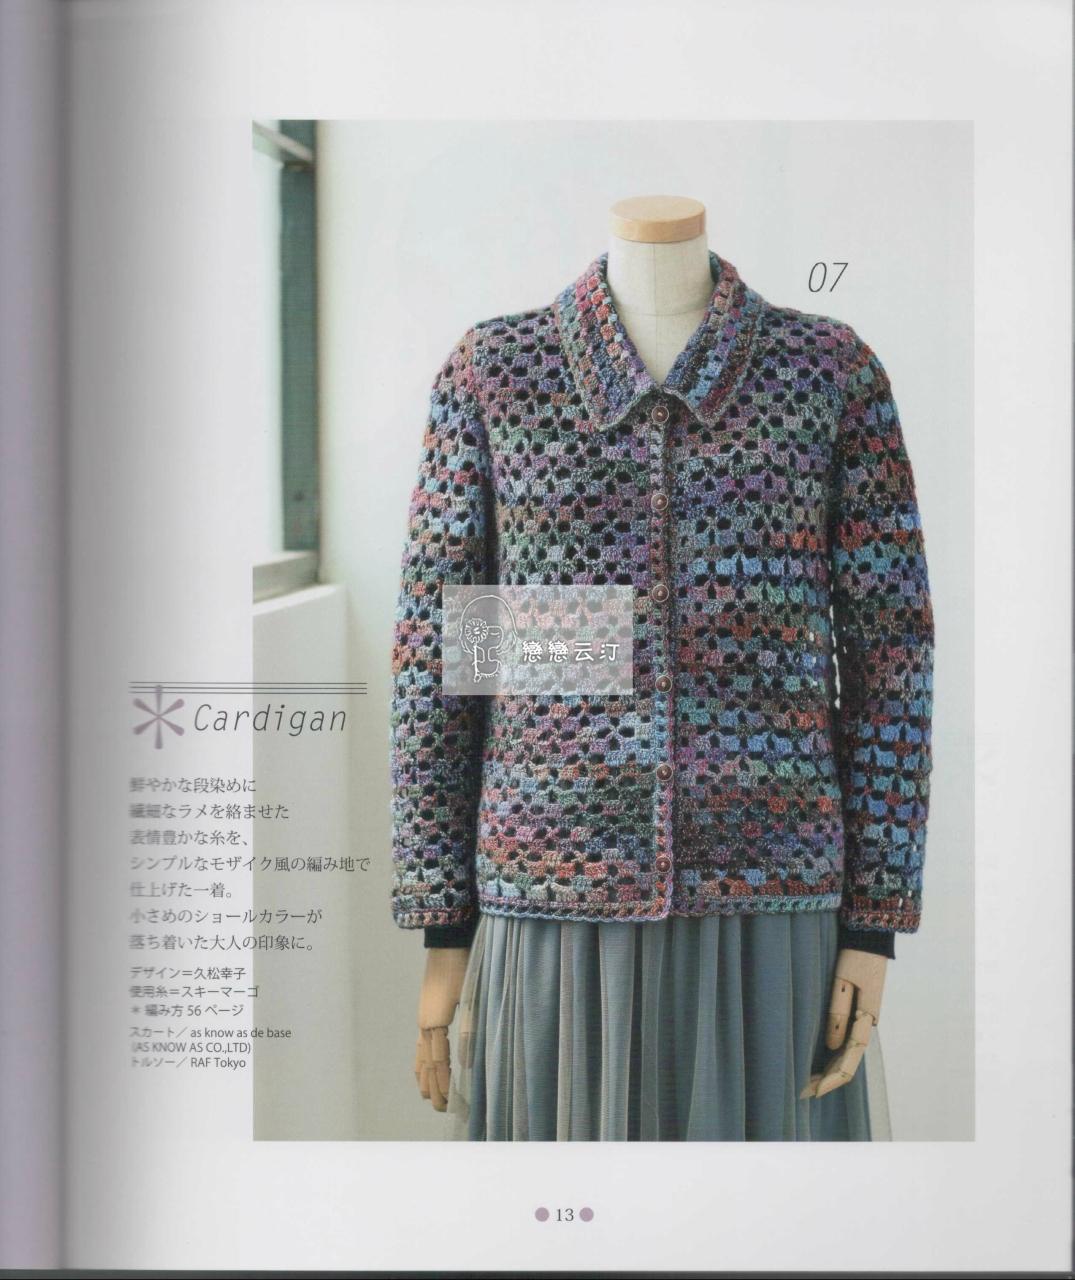 LETS KNIT SERIES №80517, 2016 - 编织幸福 - 编织幸福的博客